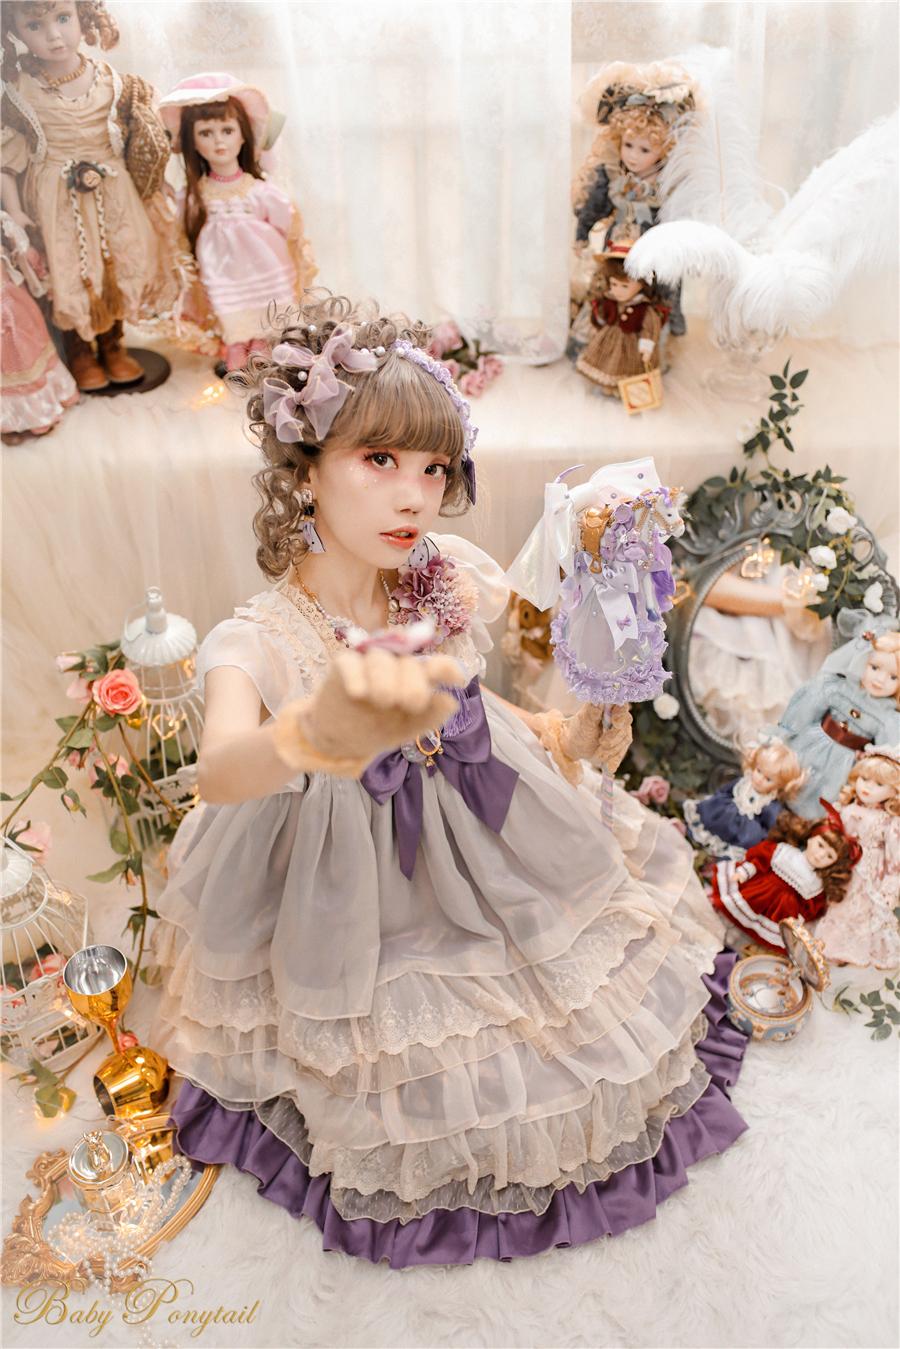 Babyponytail_Model Photo_Present Angel_JSK Violet_2_Kaka_07.jpg